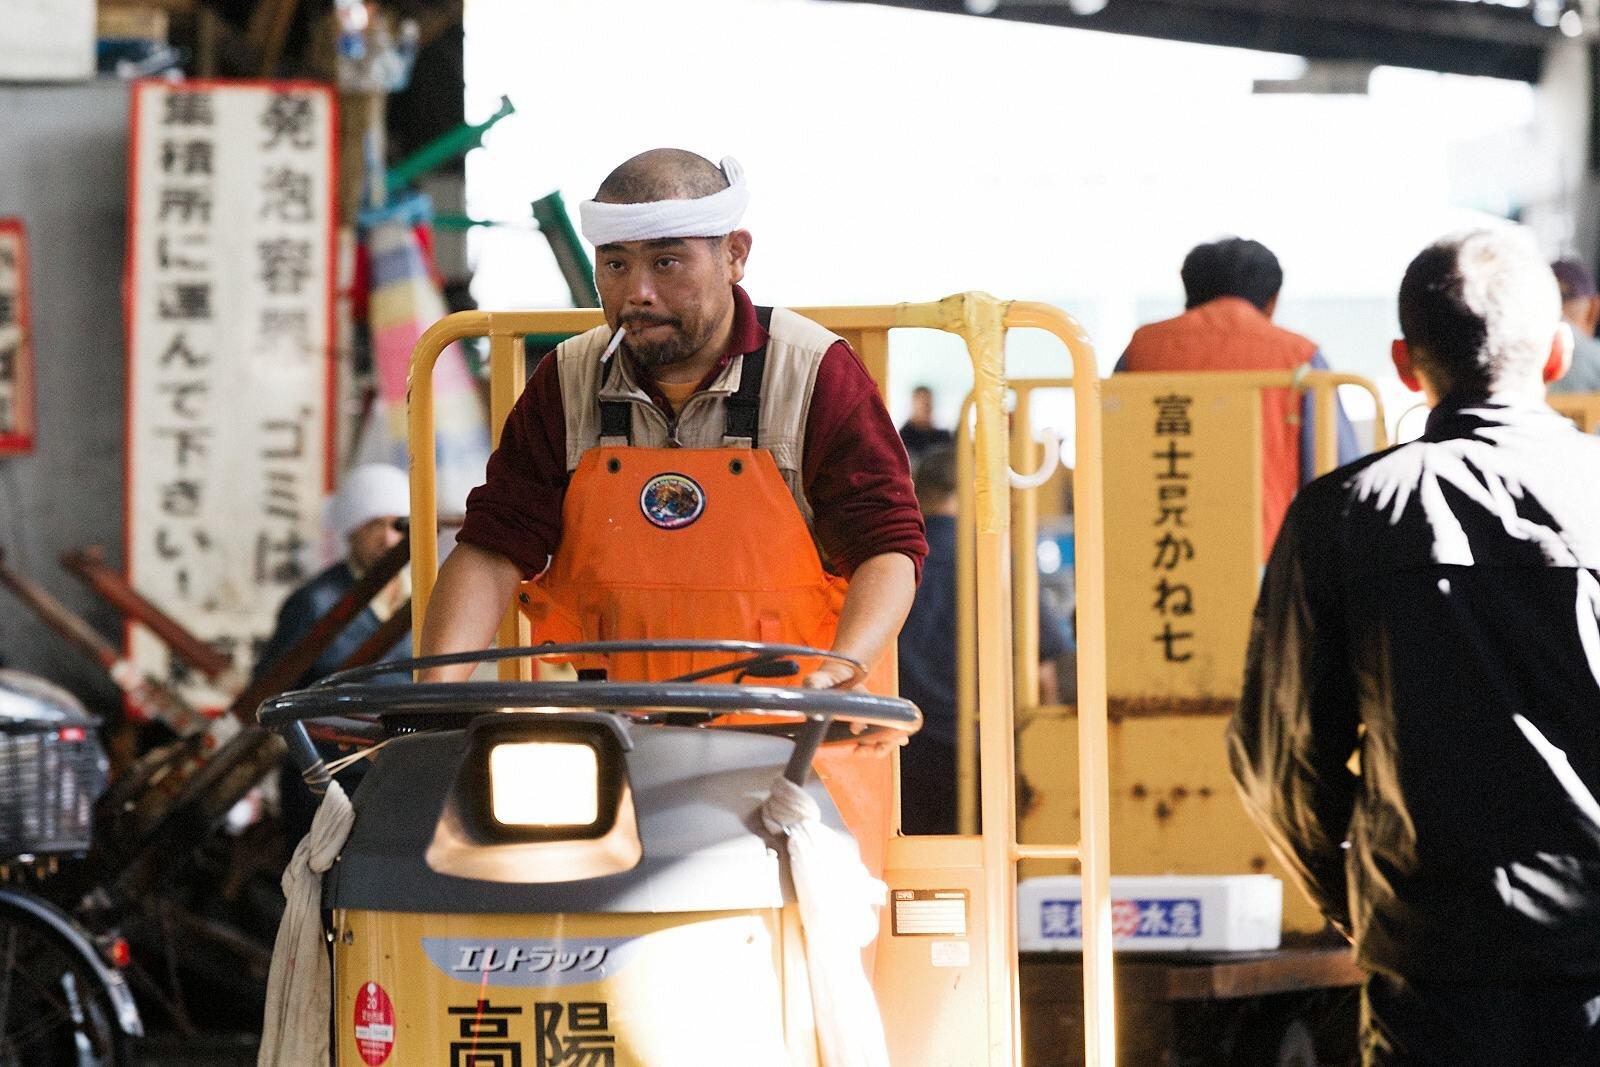 KatSchleicher_Tsukiji019.jpg